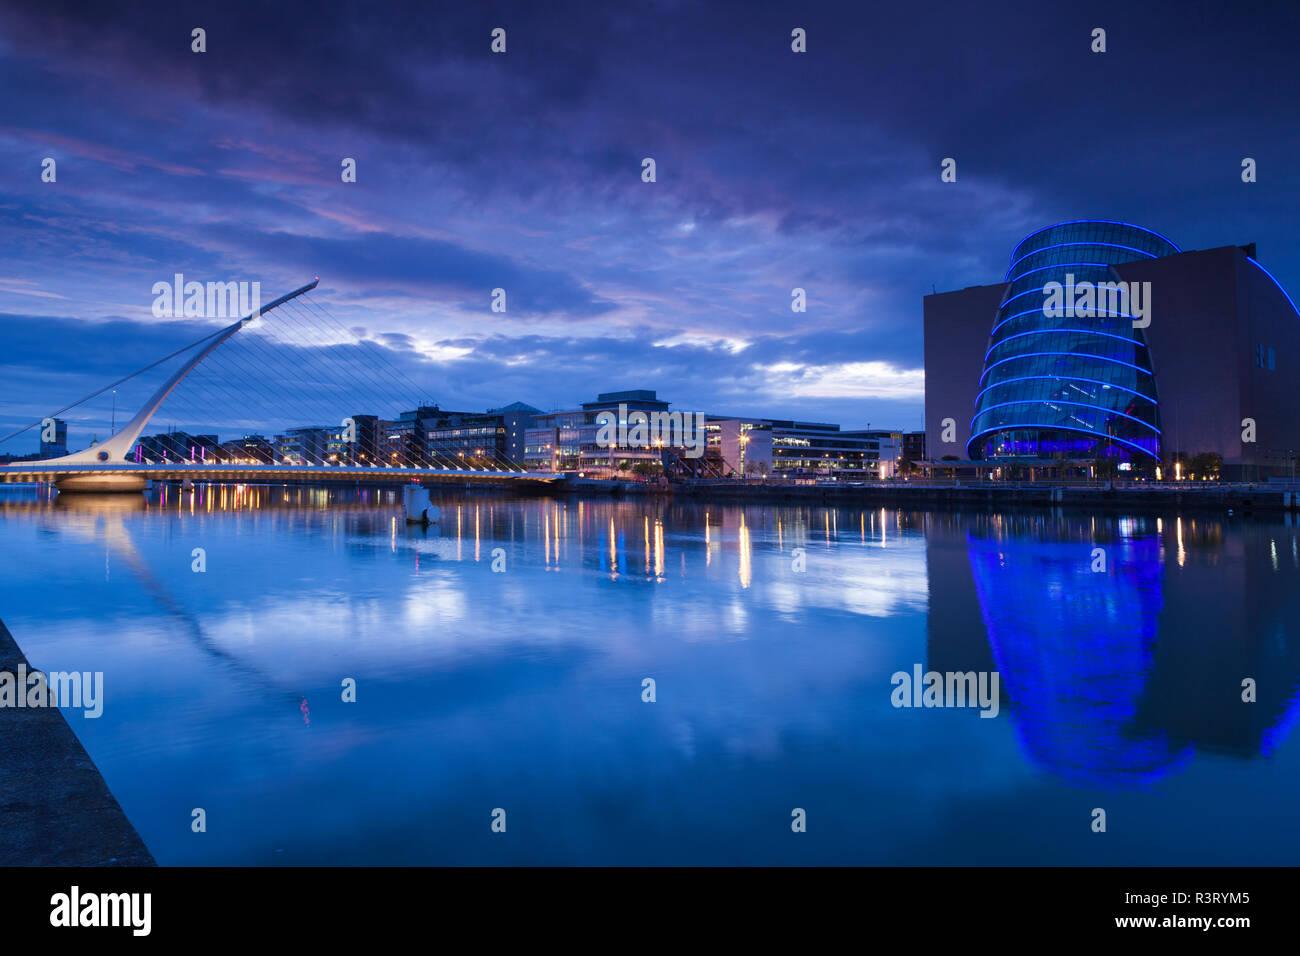 Ireland, Dublin, Docklands, Samuel Beckett Bridge, Santiago Calatrava, architect and Convention Centre Dublin, dusk - Stock Image